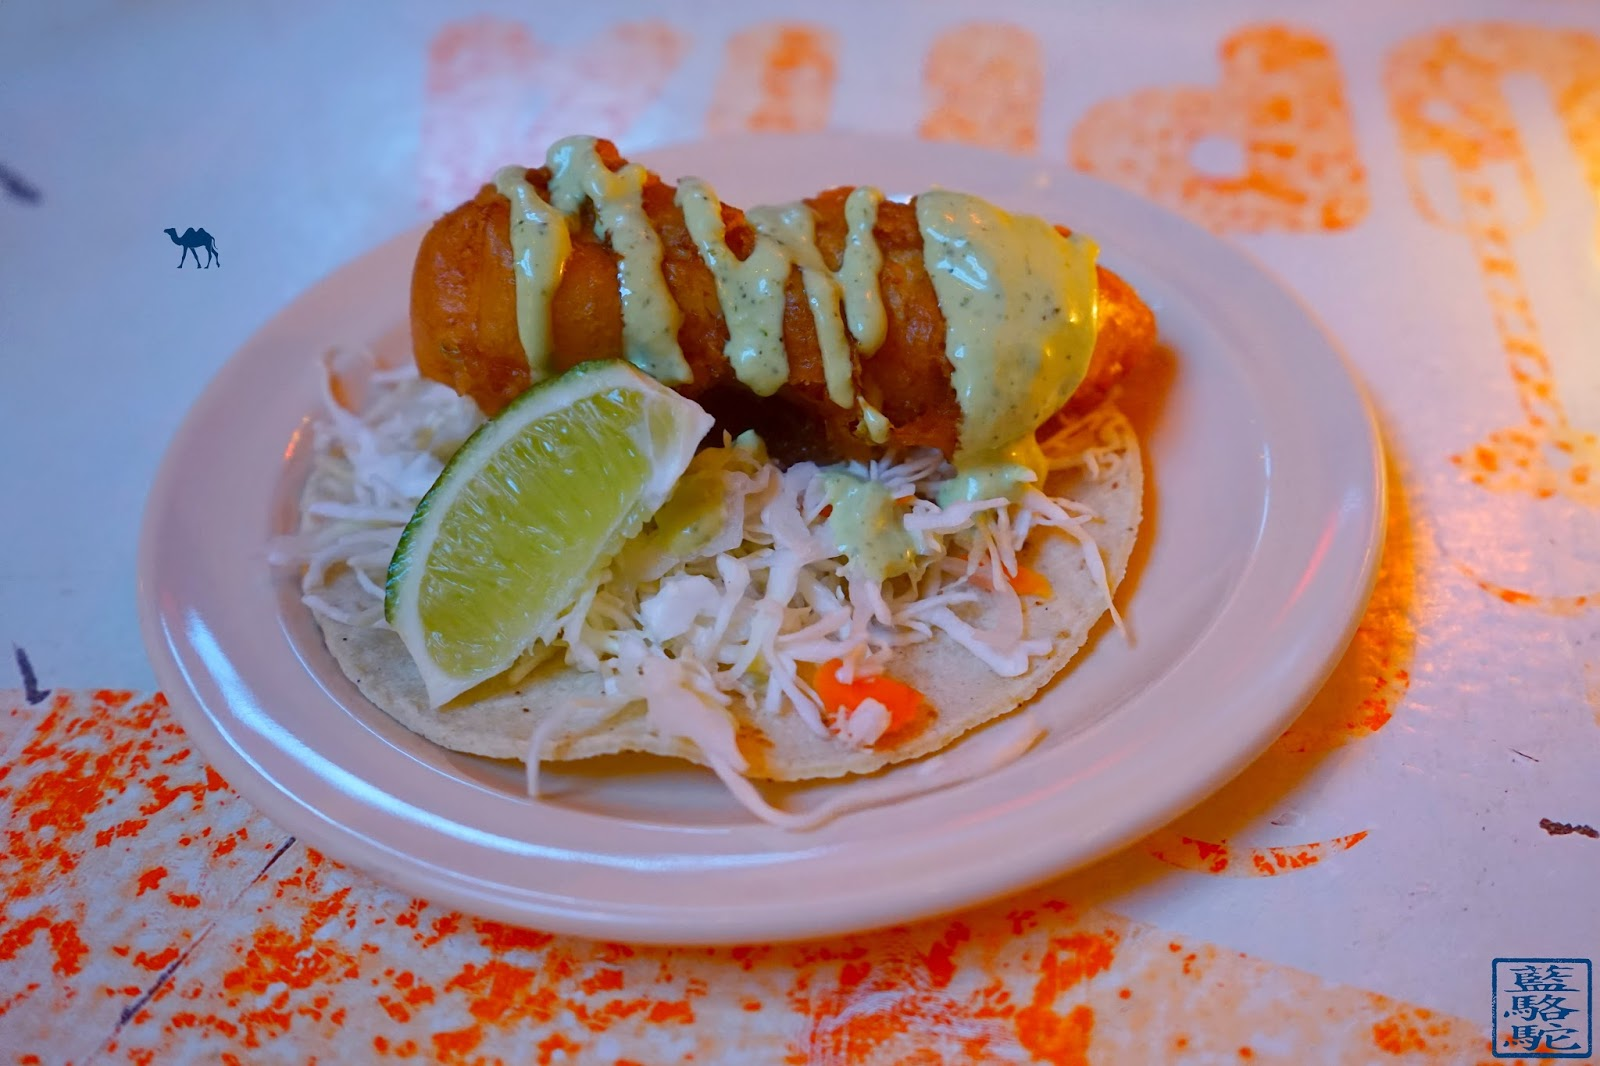 Le Chameau Bleu - Tacombi - Crispy Fish Tacos New York USA